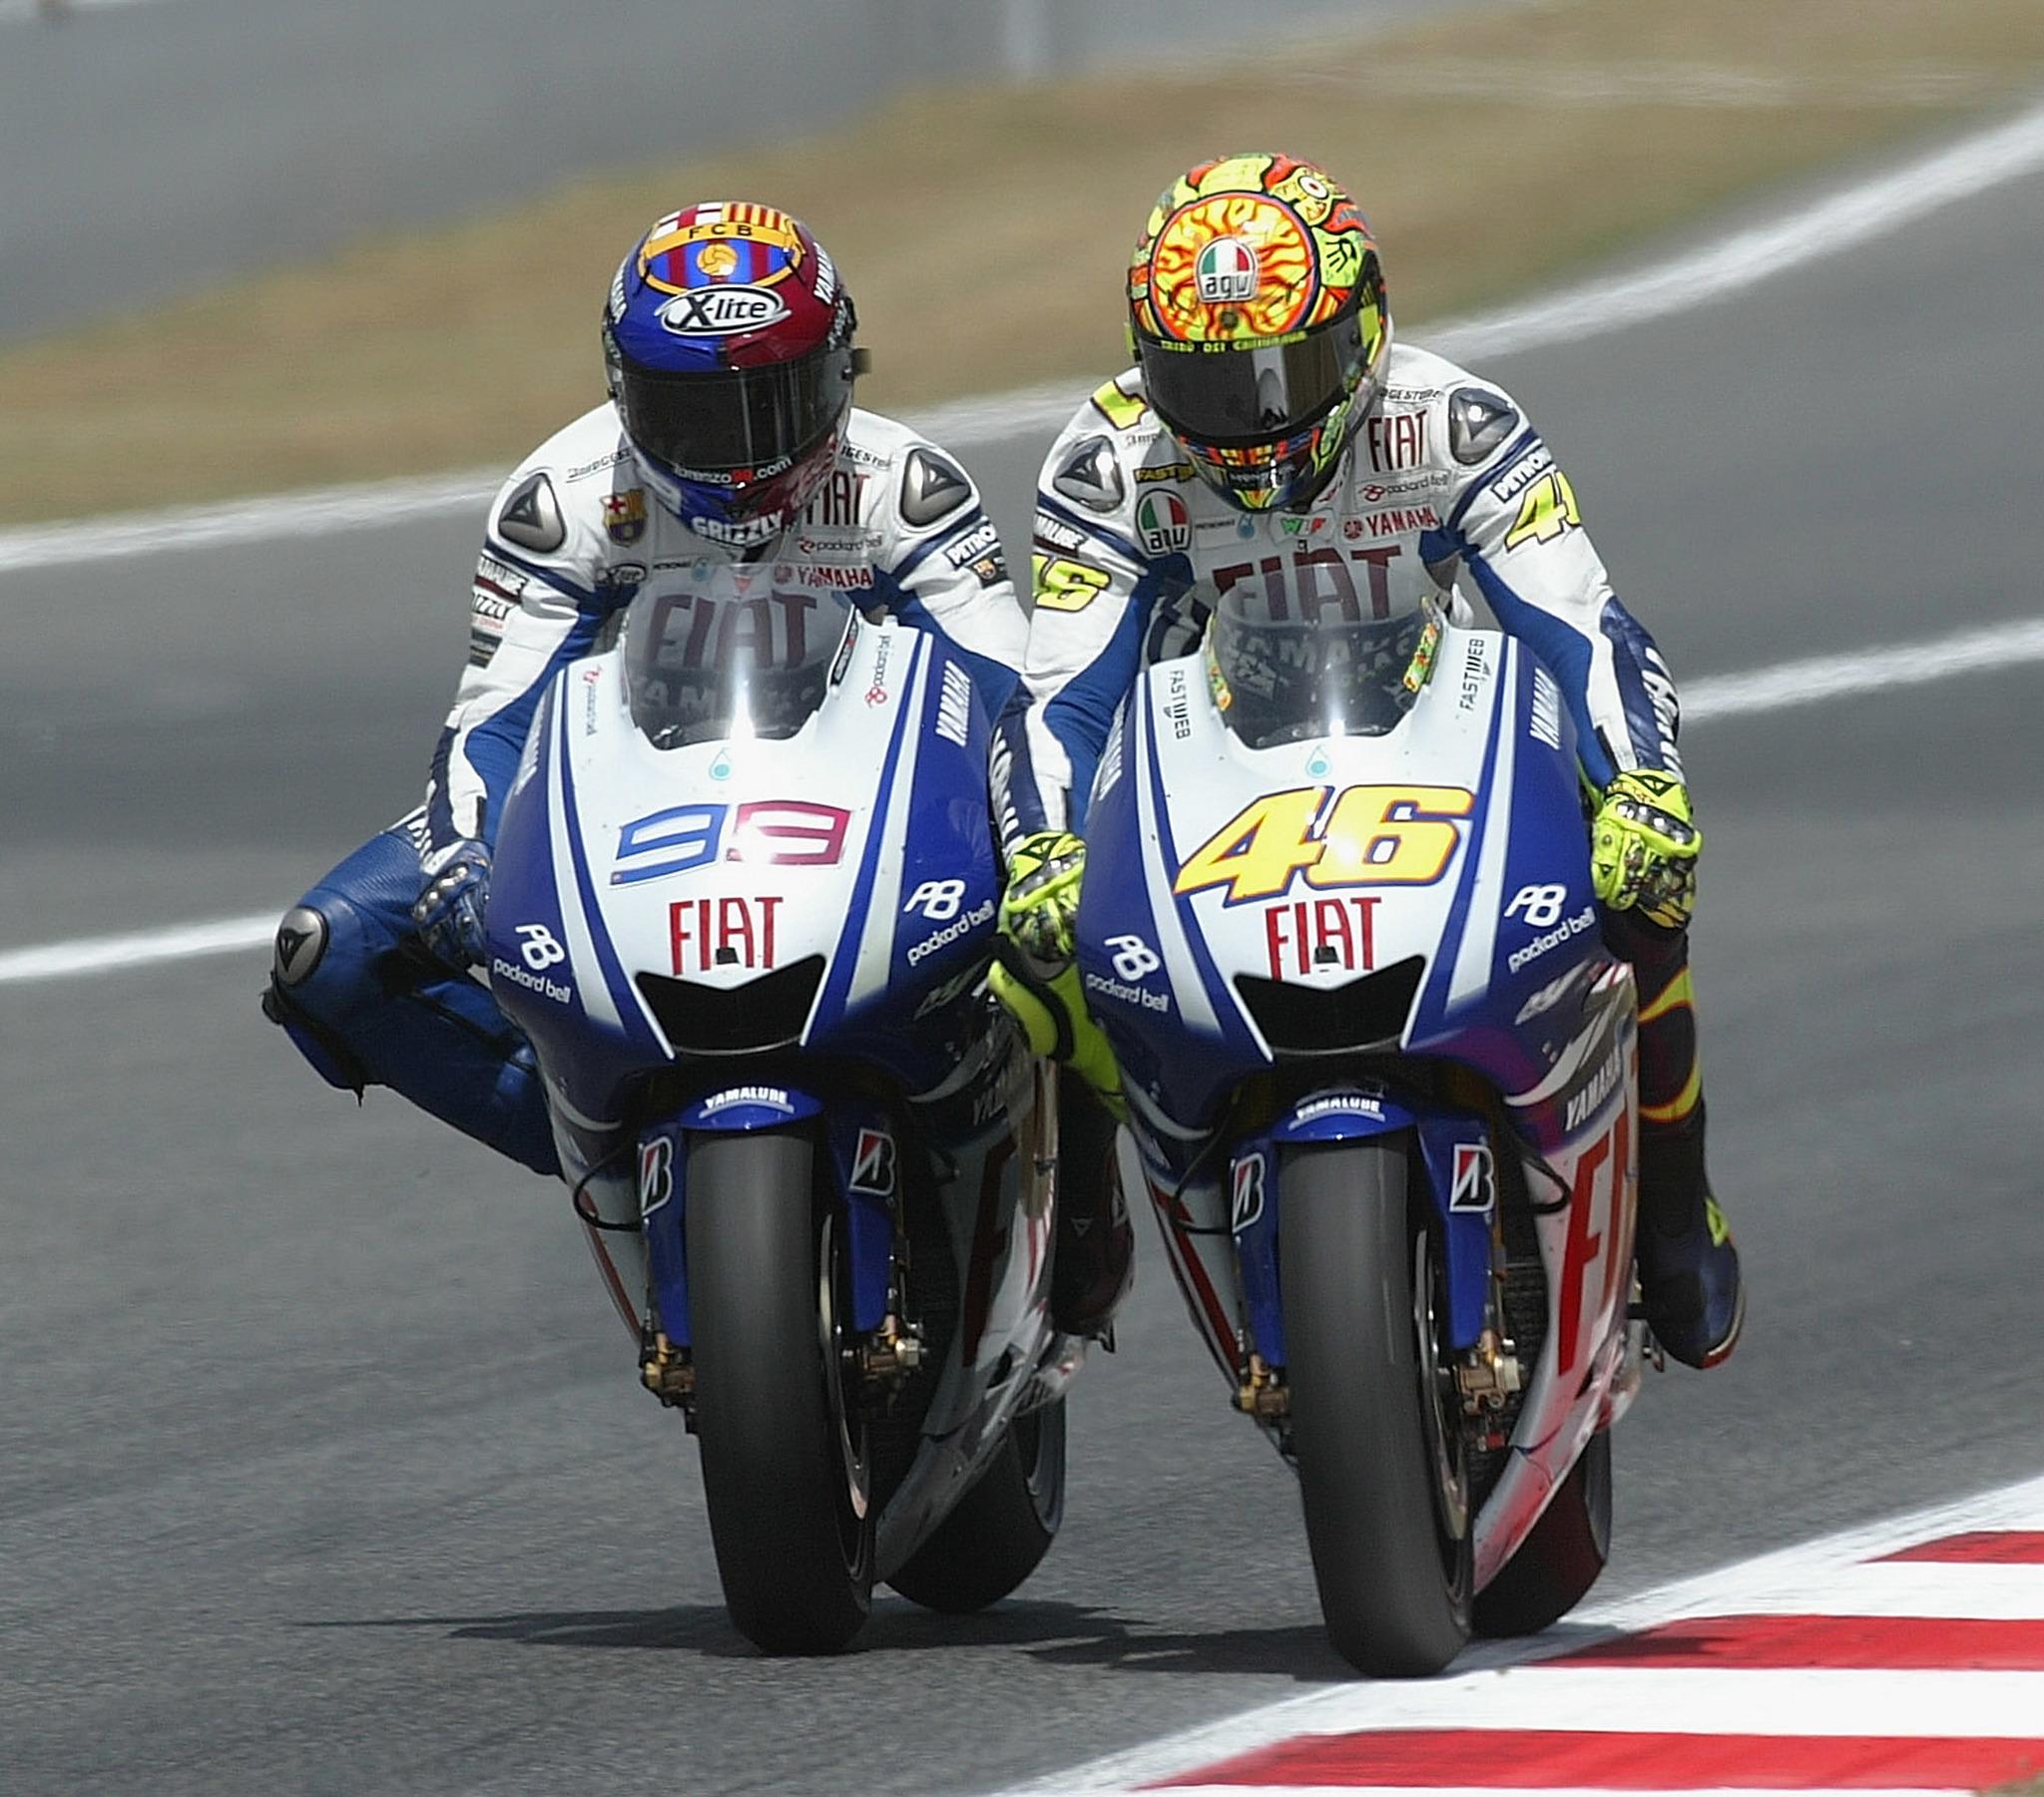 Calendario Max 2005.Motogp News Valentino Rossi Has A History Of Rivalries